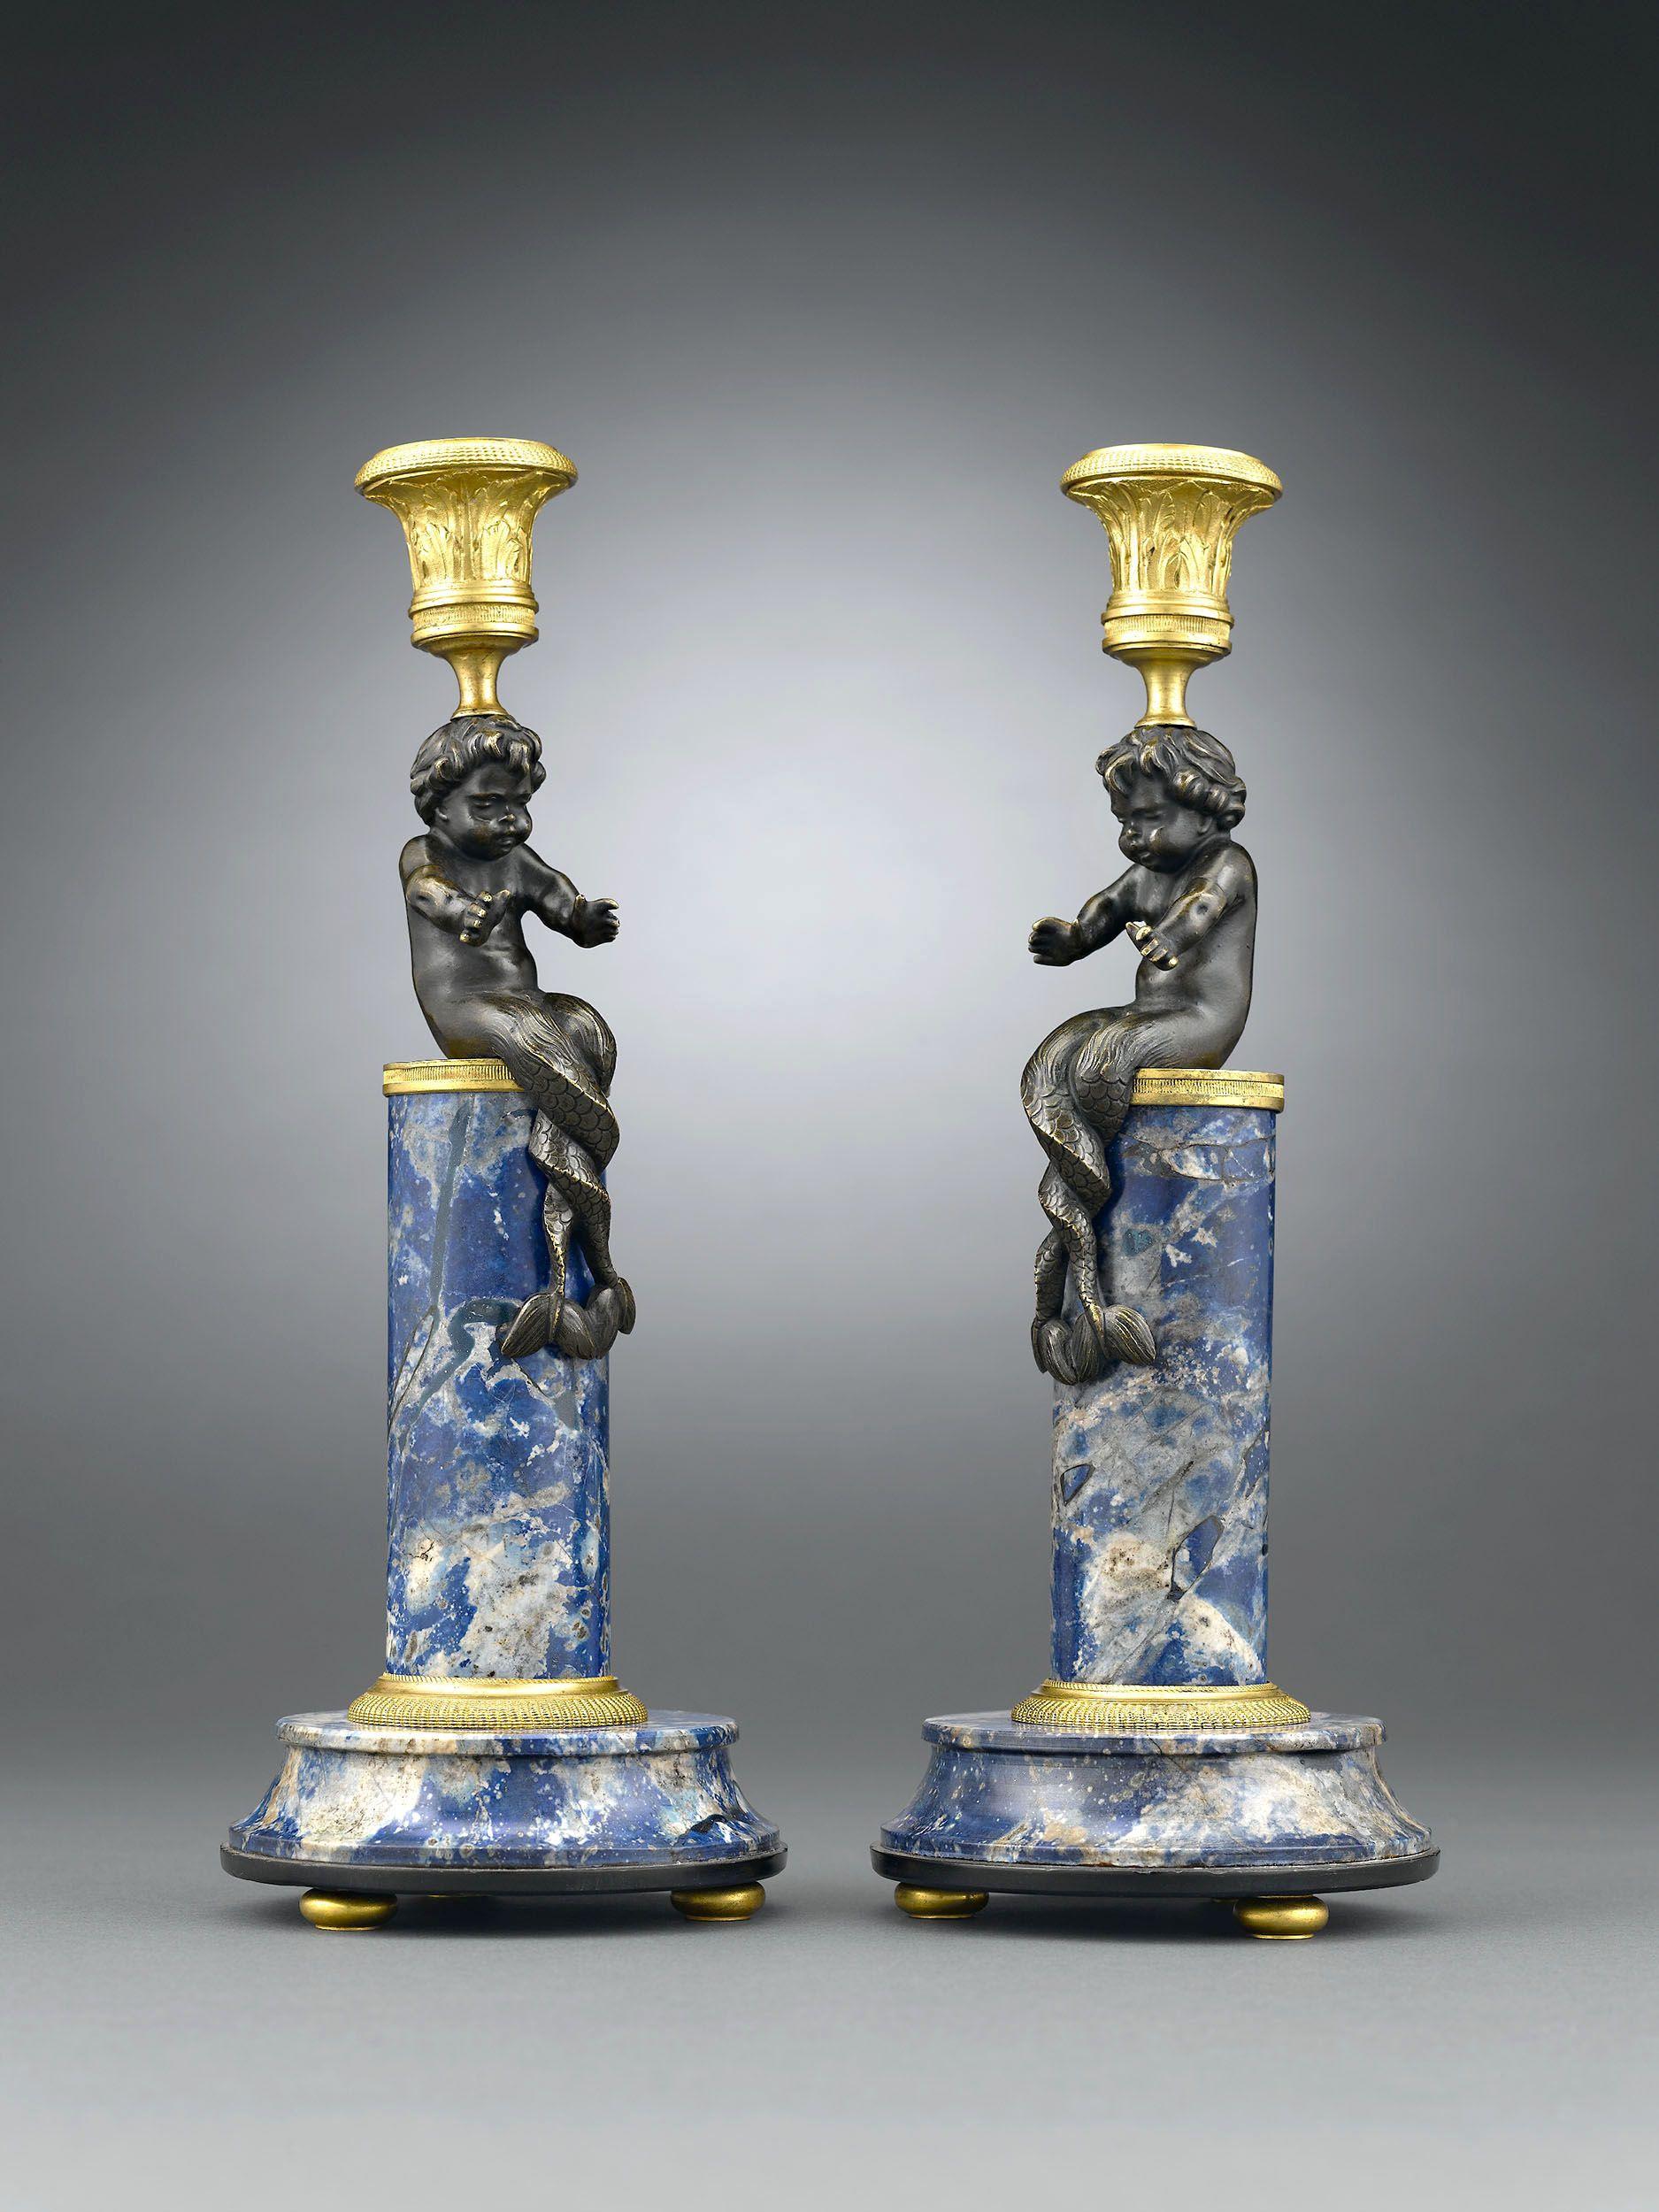 Renaissance Period Lapis Lazuli Candlesticks, Circa 1600